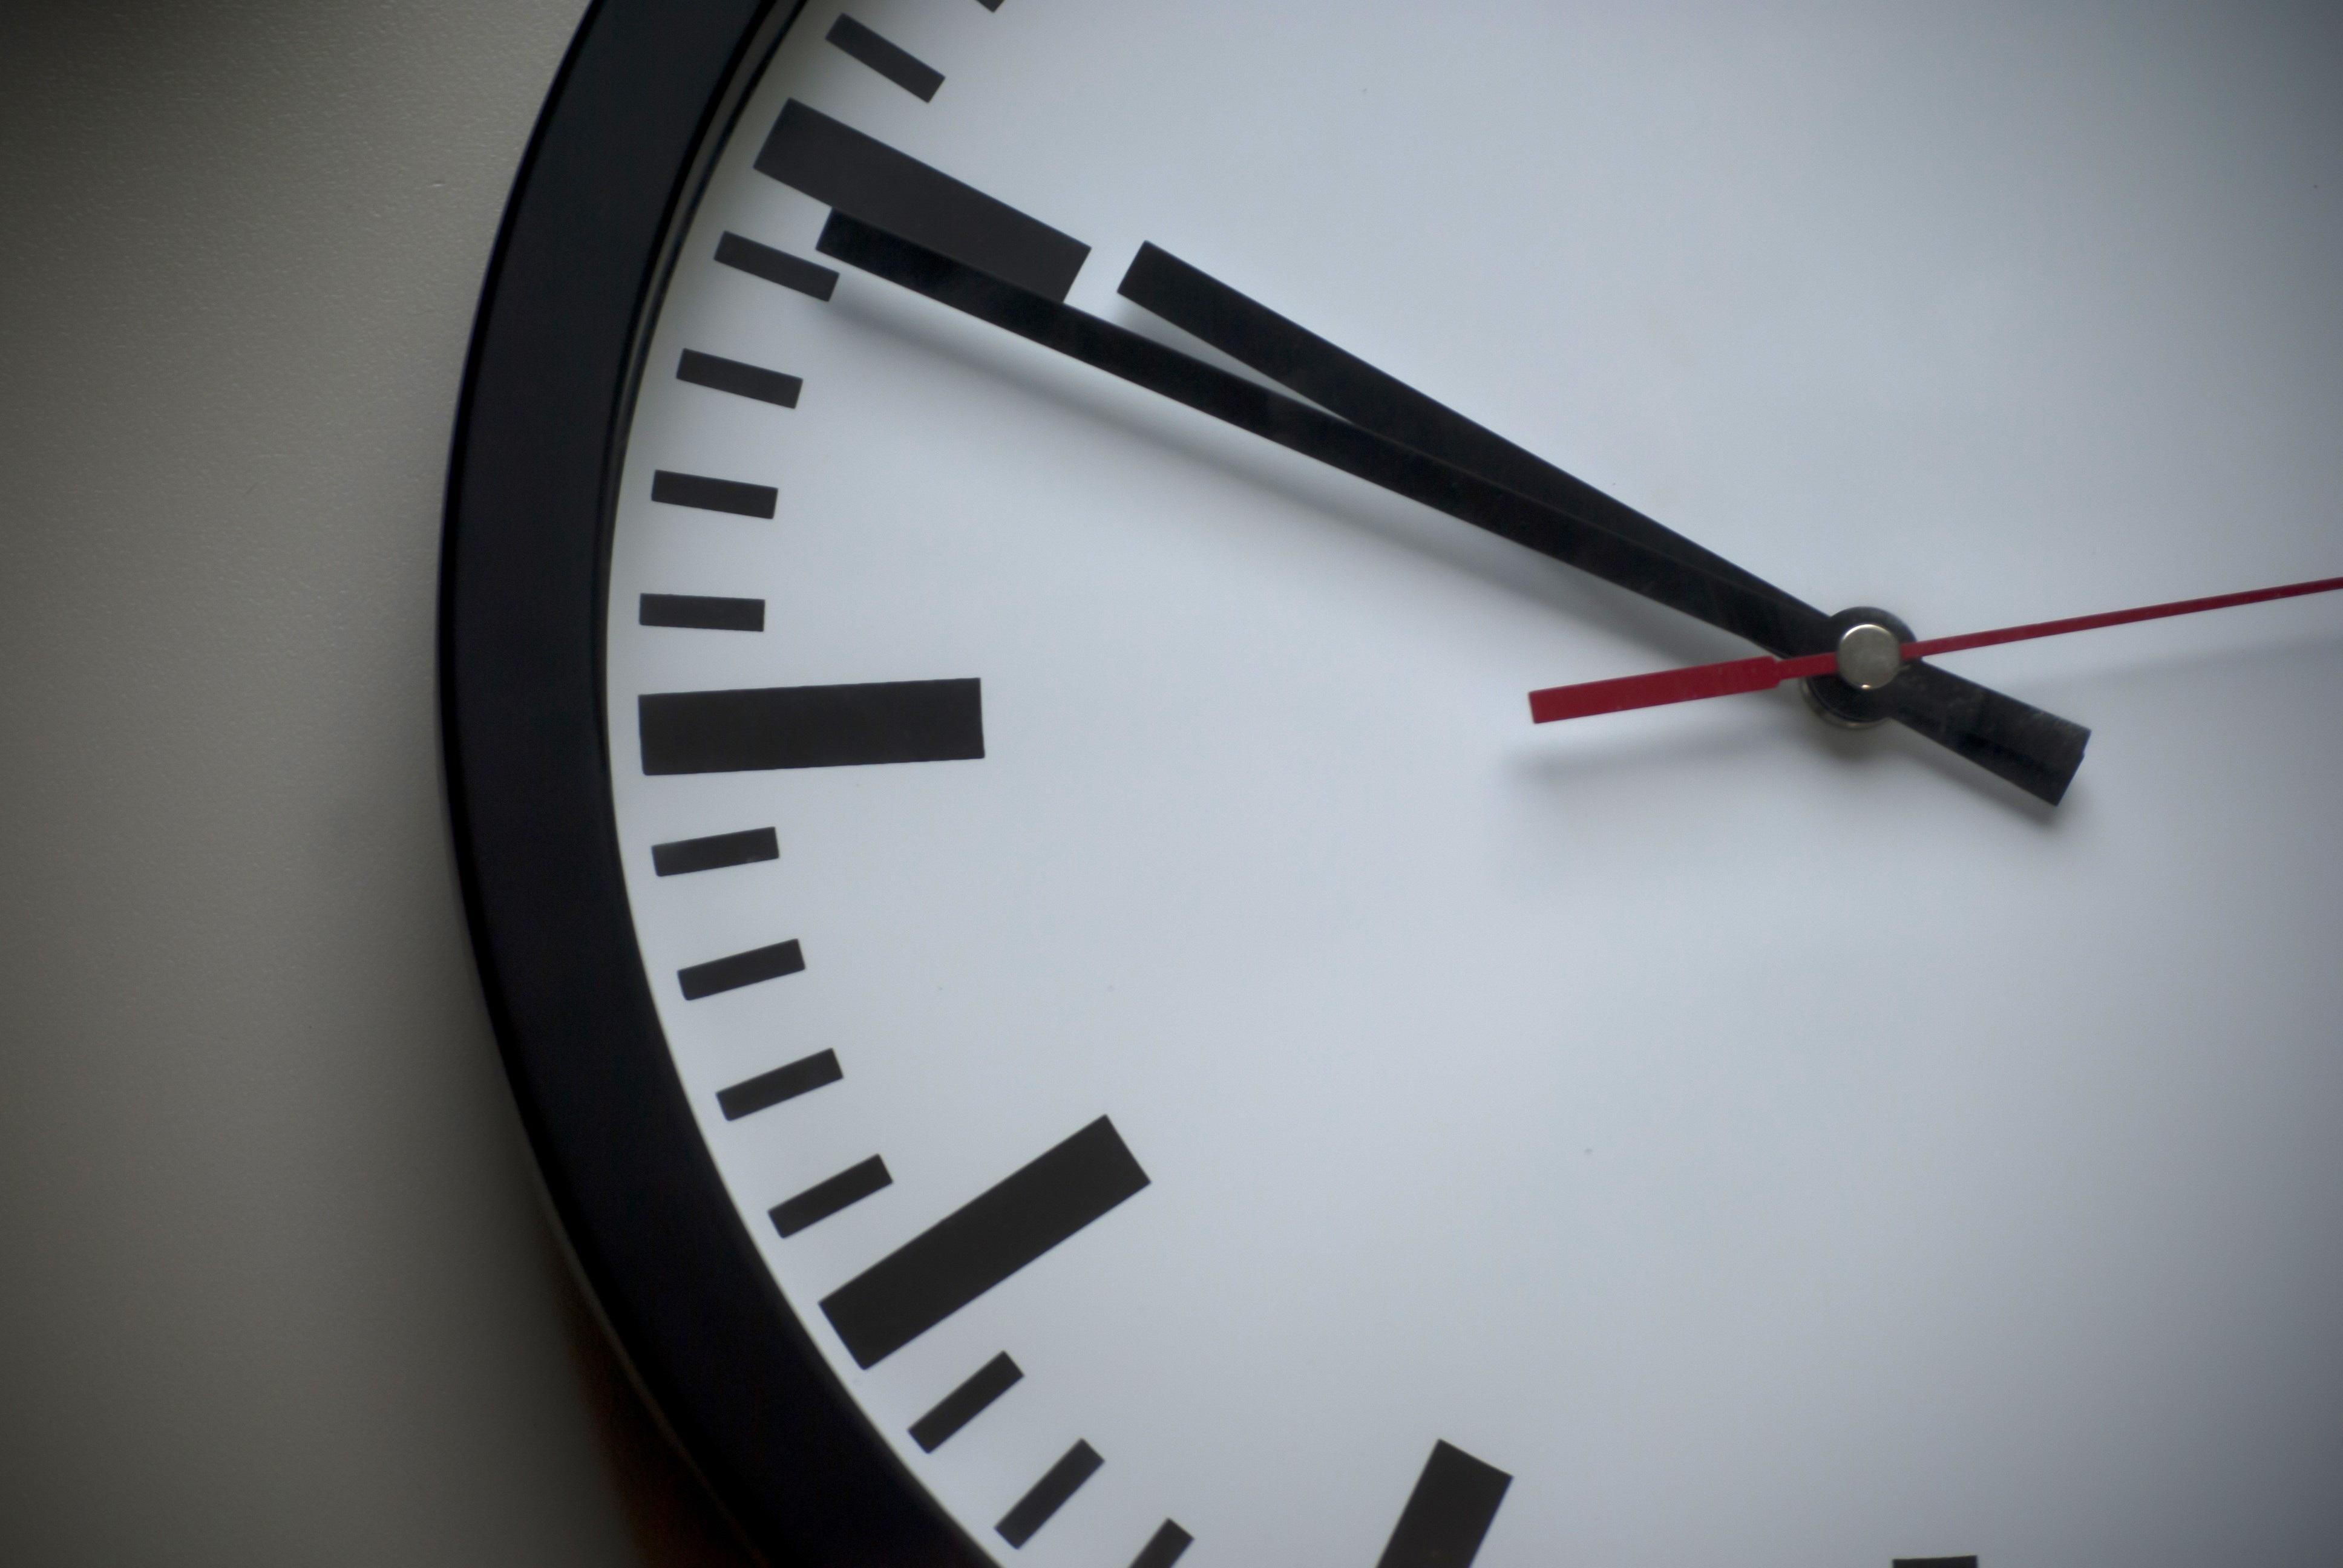 Shallow Focus Photo of White Analog Clock